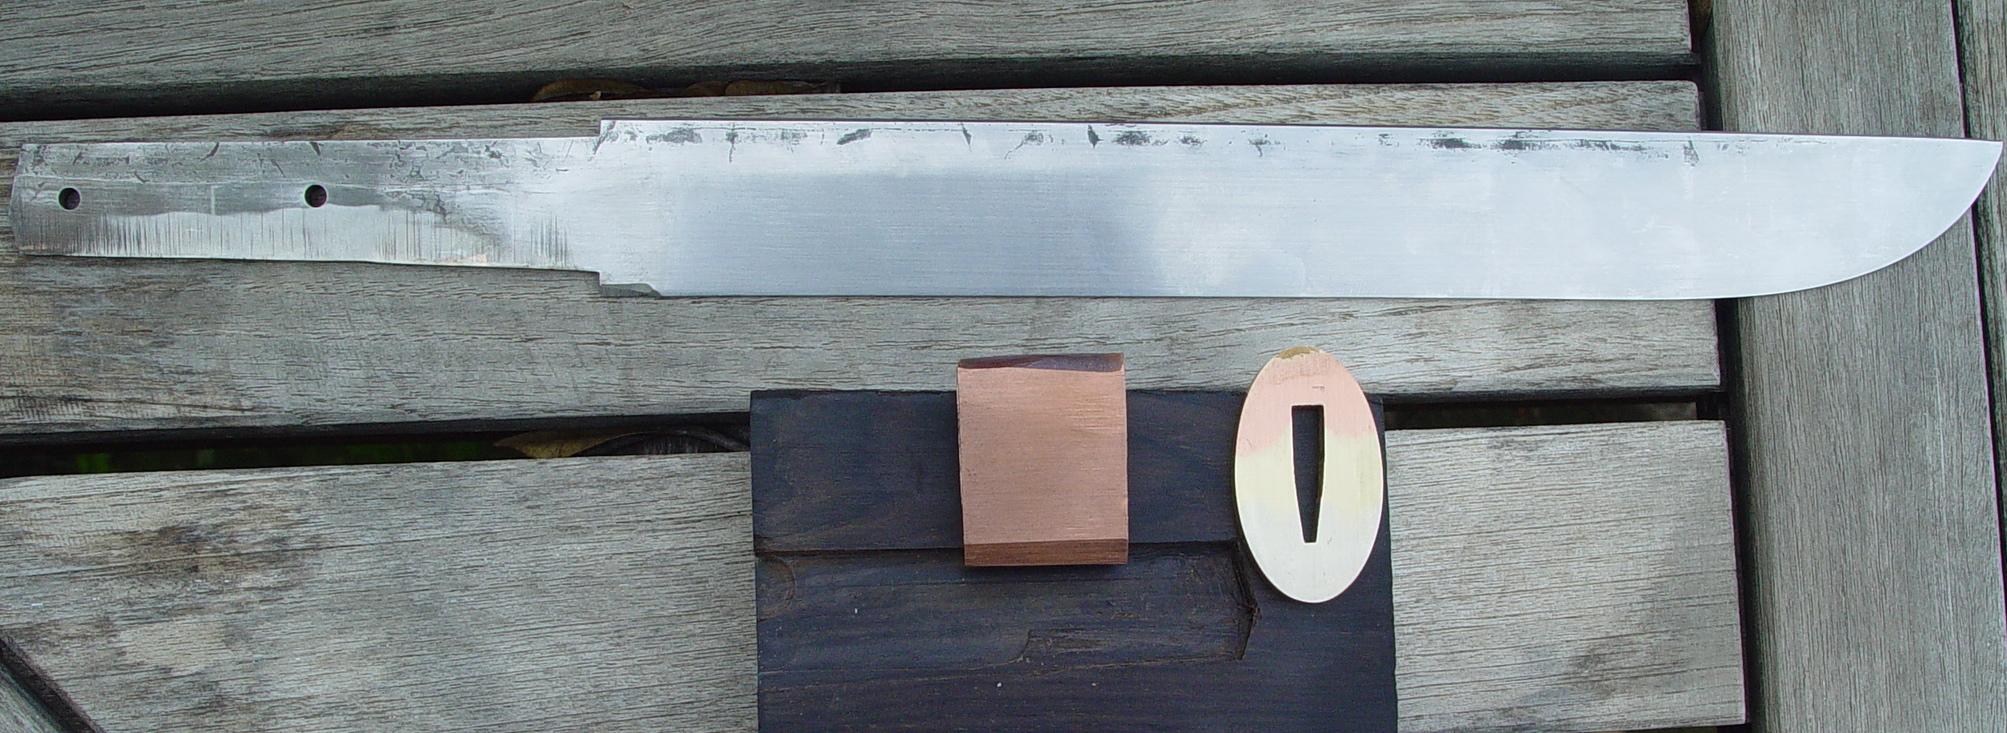 Mokume Tsuba and Copper Habaki. Blade is Vinland patern by Damasteel